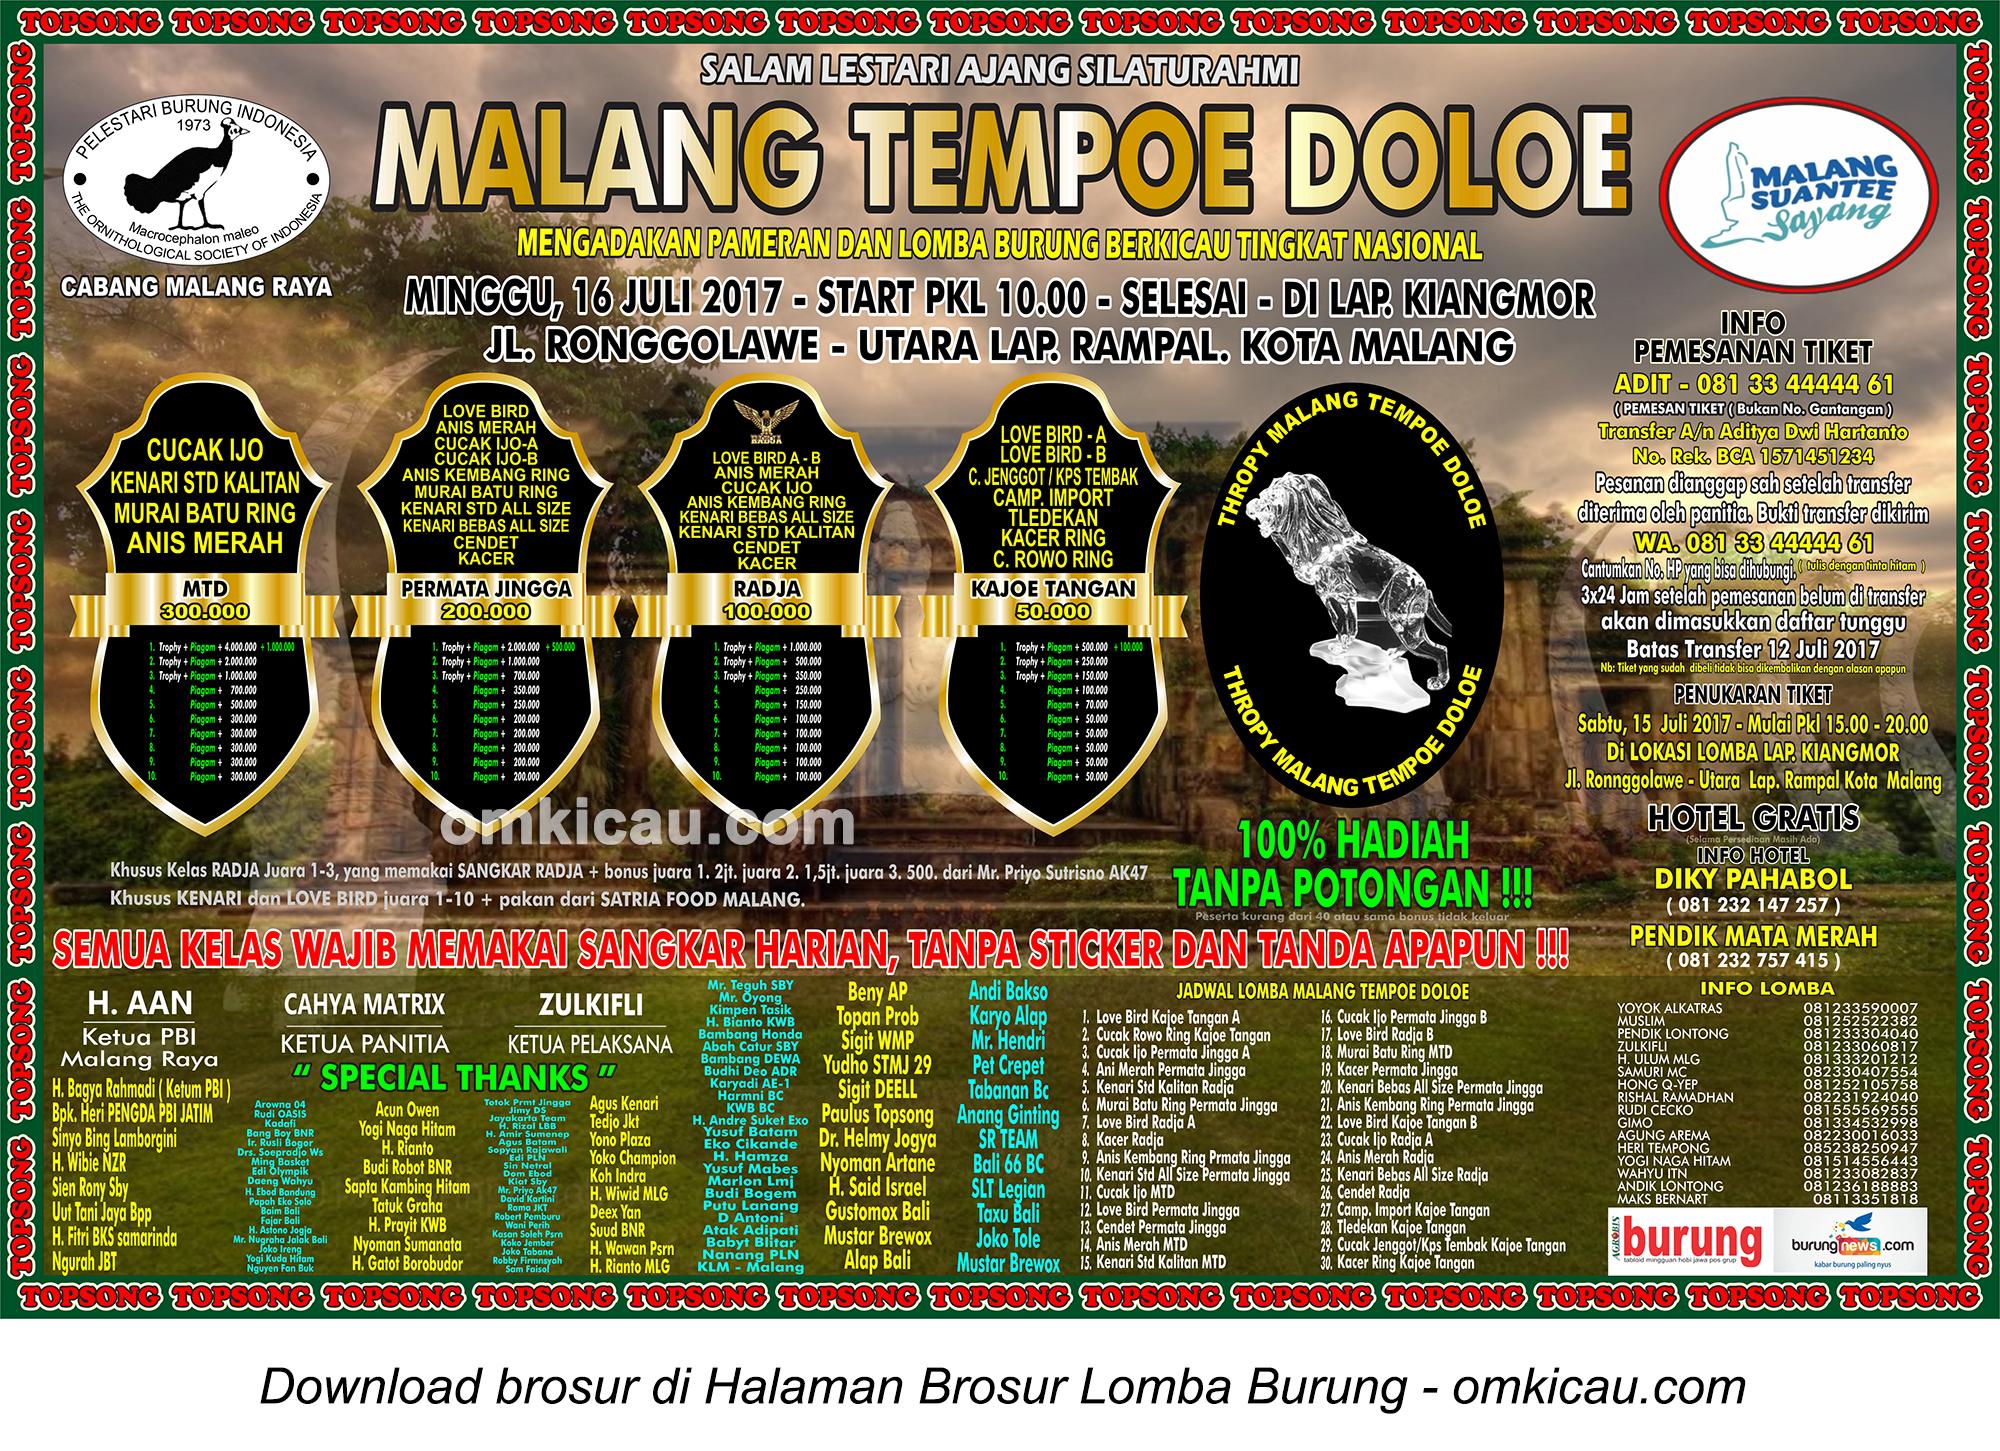 Brosur Lomba Burung Berkicau Malang Tempoe Doeloe, Malang, 16 Juli 2017